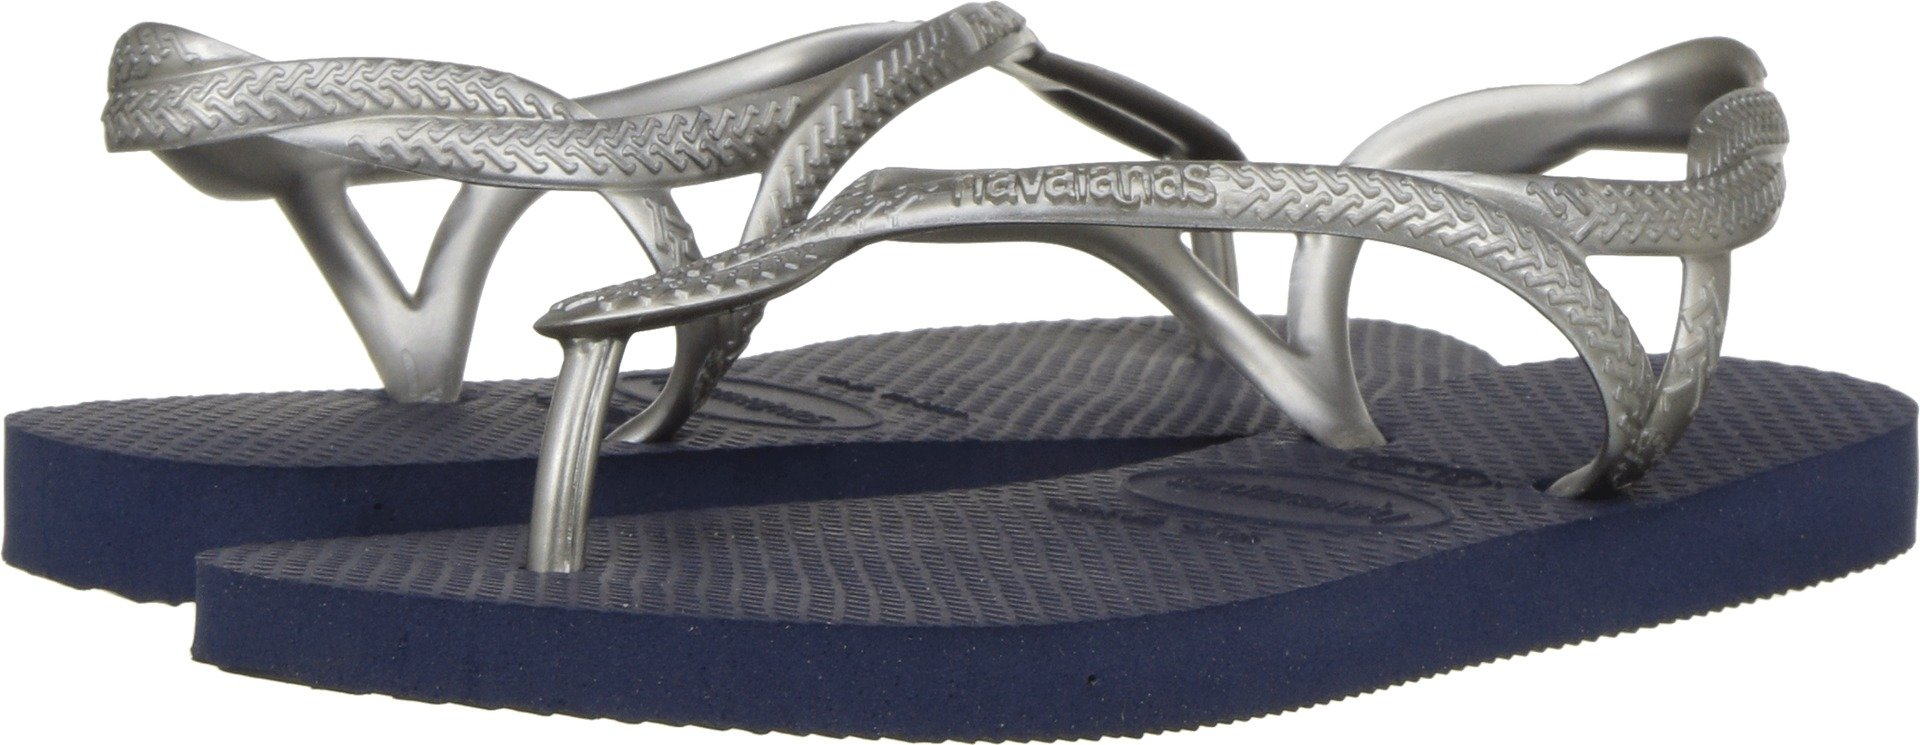 Havaianas Kids Girl's Luna Sandals (Little Kid/Big Kid) Navy Blue/Silver 33-34 M EU